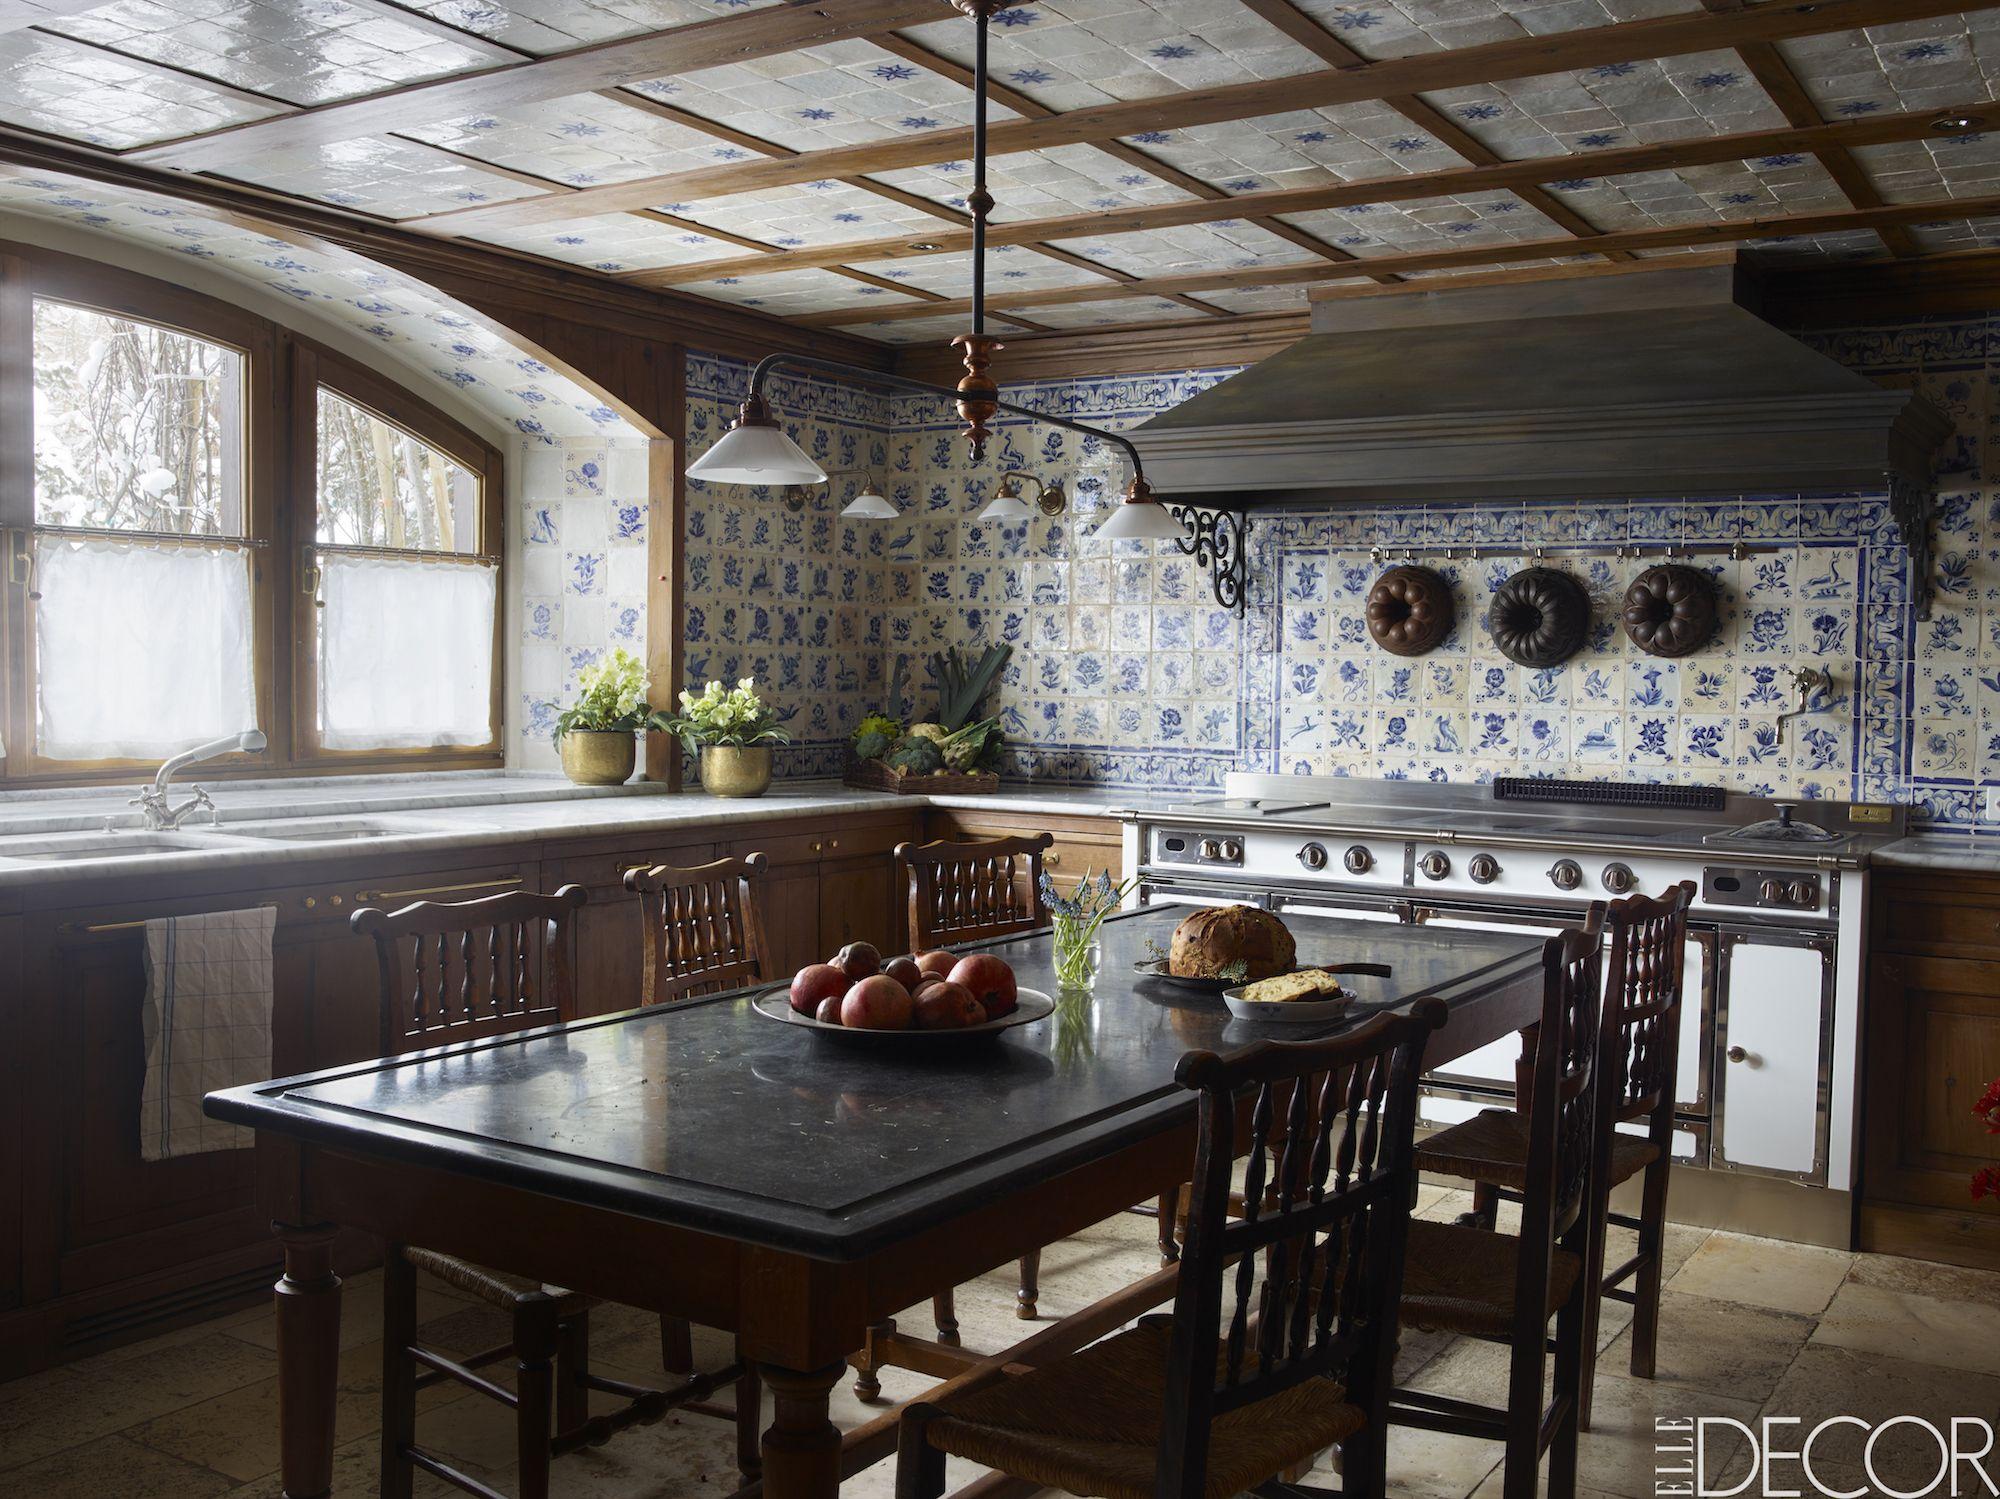 15 Best Kitchen Backsplash Tile Ideas Kitchen Tiles